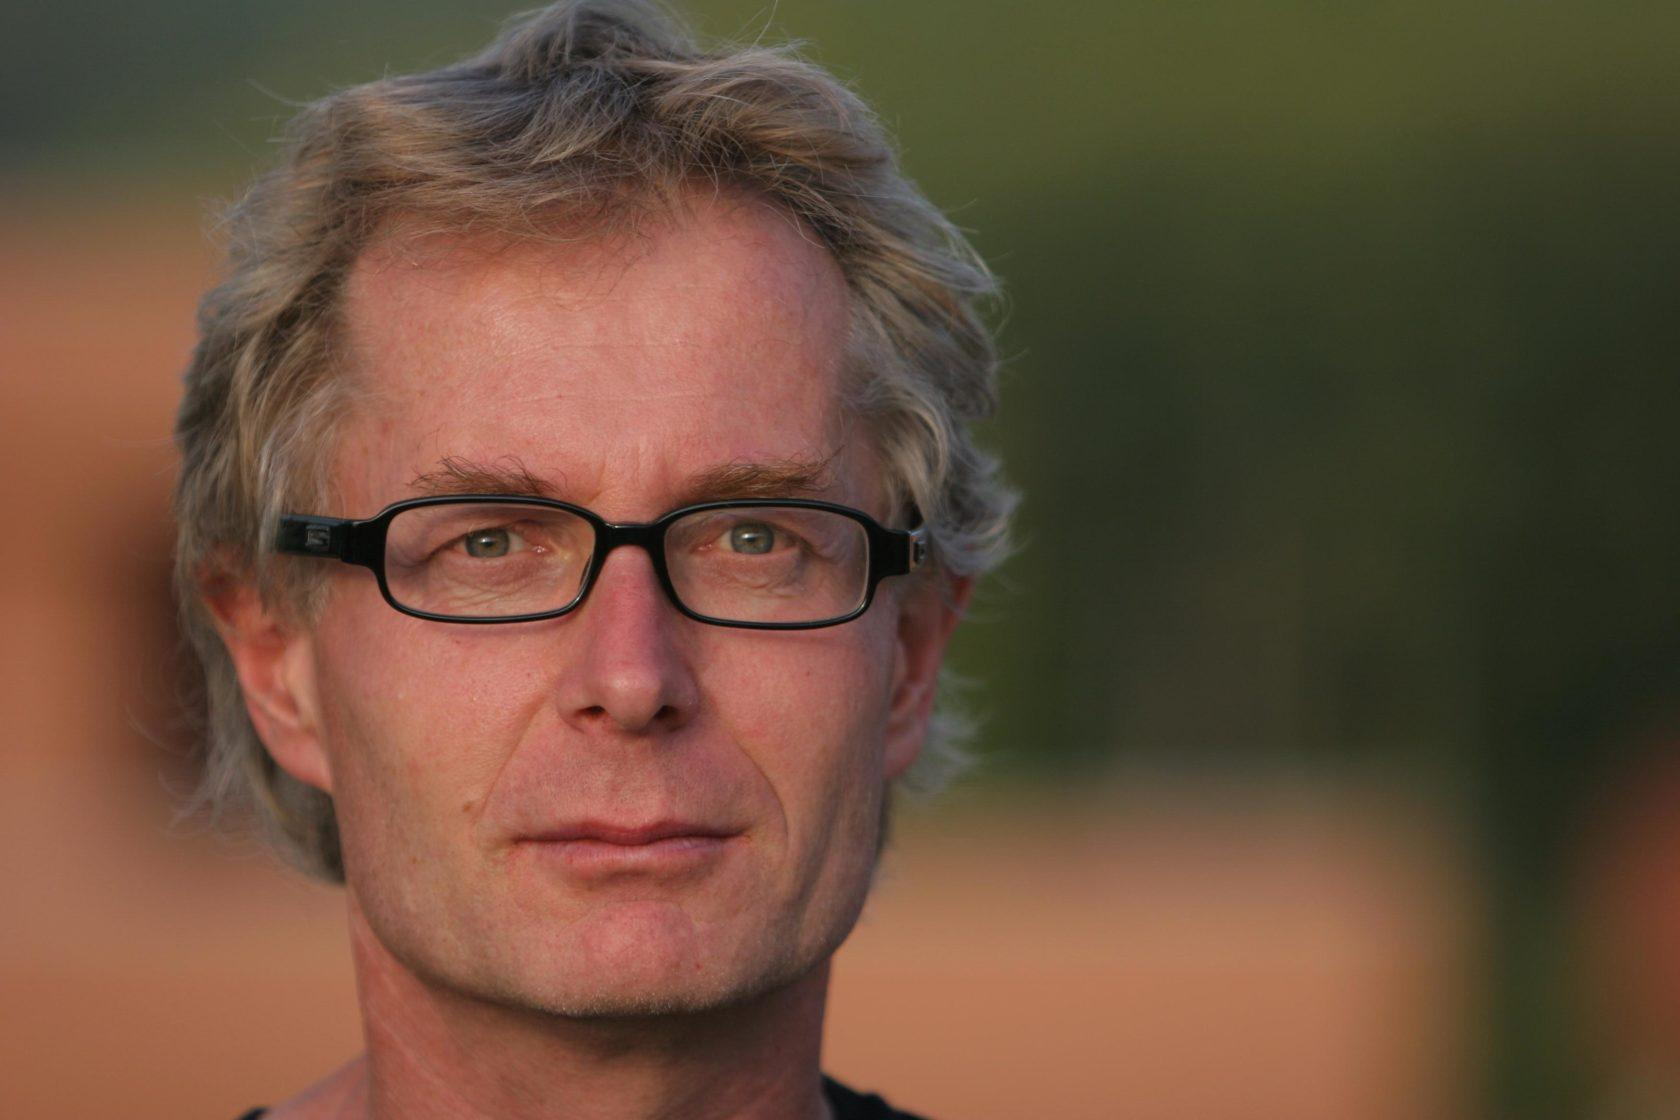 DI Wolfgang Köck